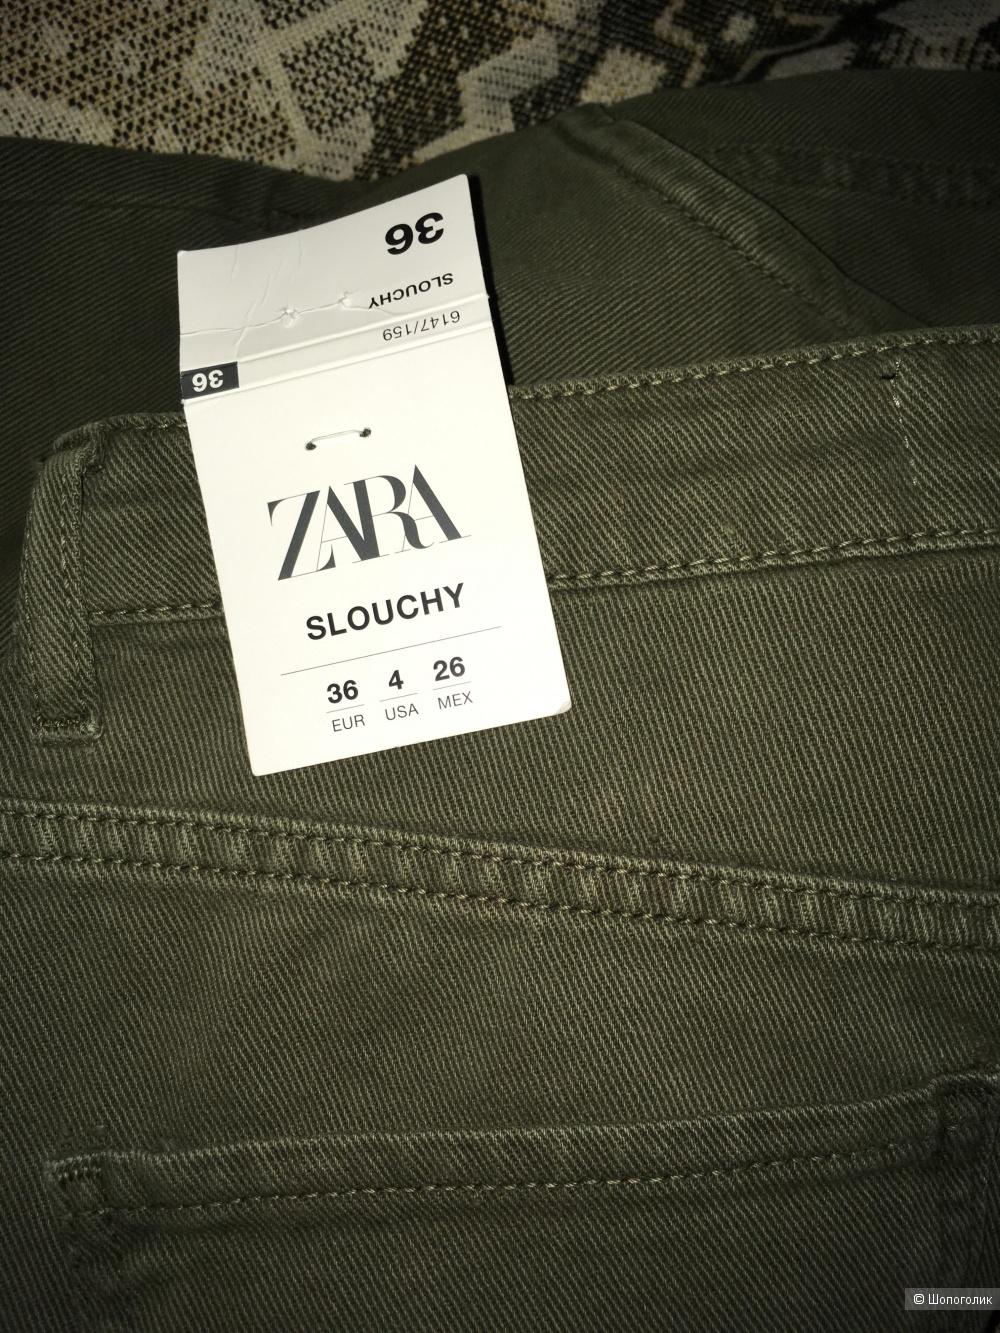 Джинсы Zara slouchy размер 36